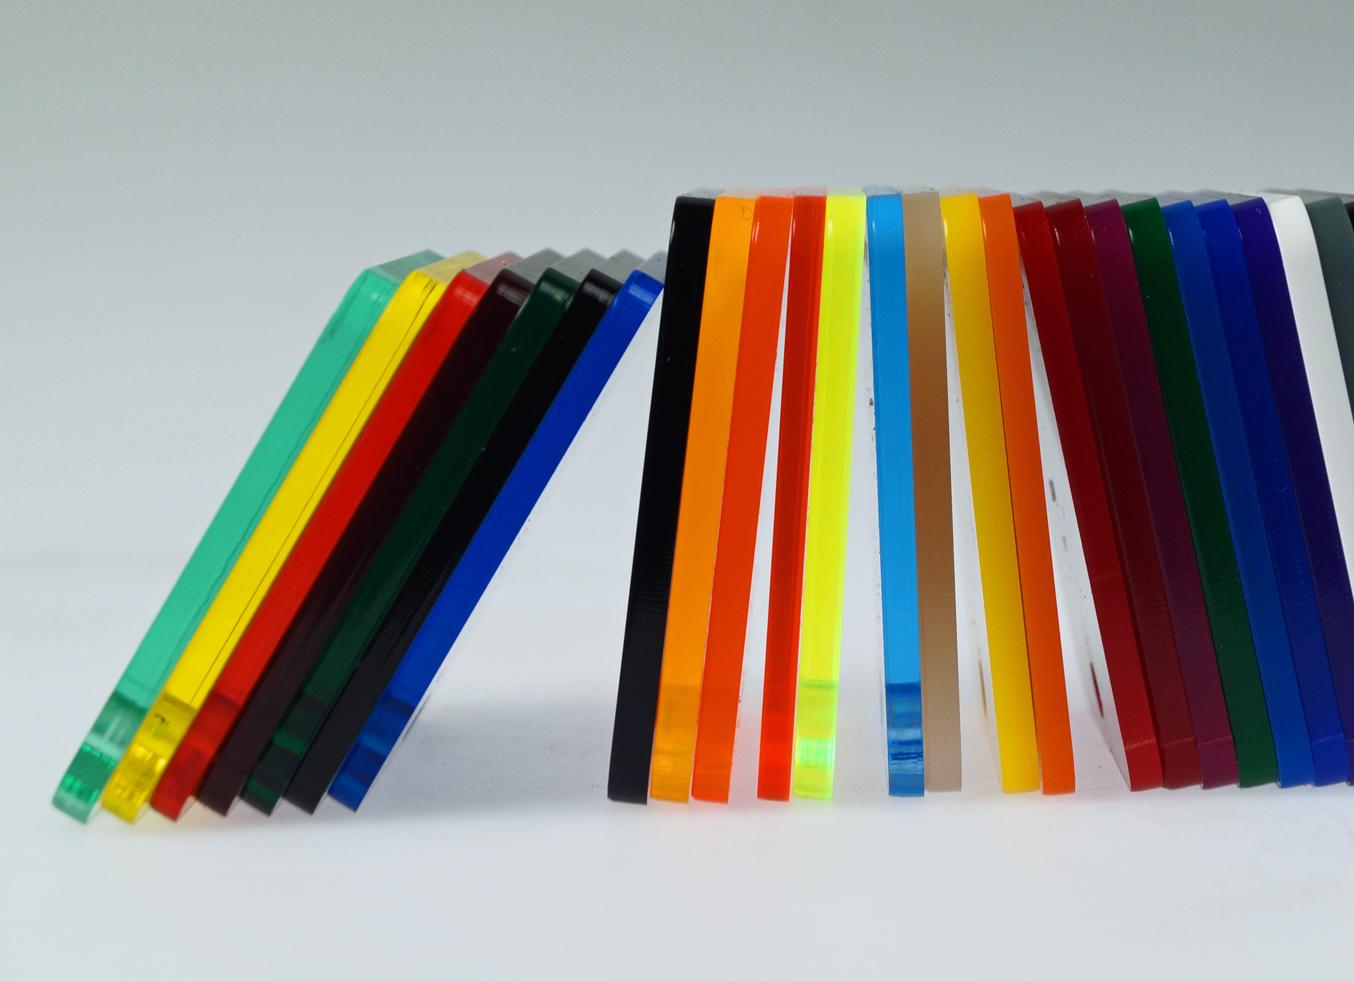 New color acrylic sheets range